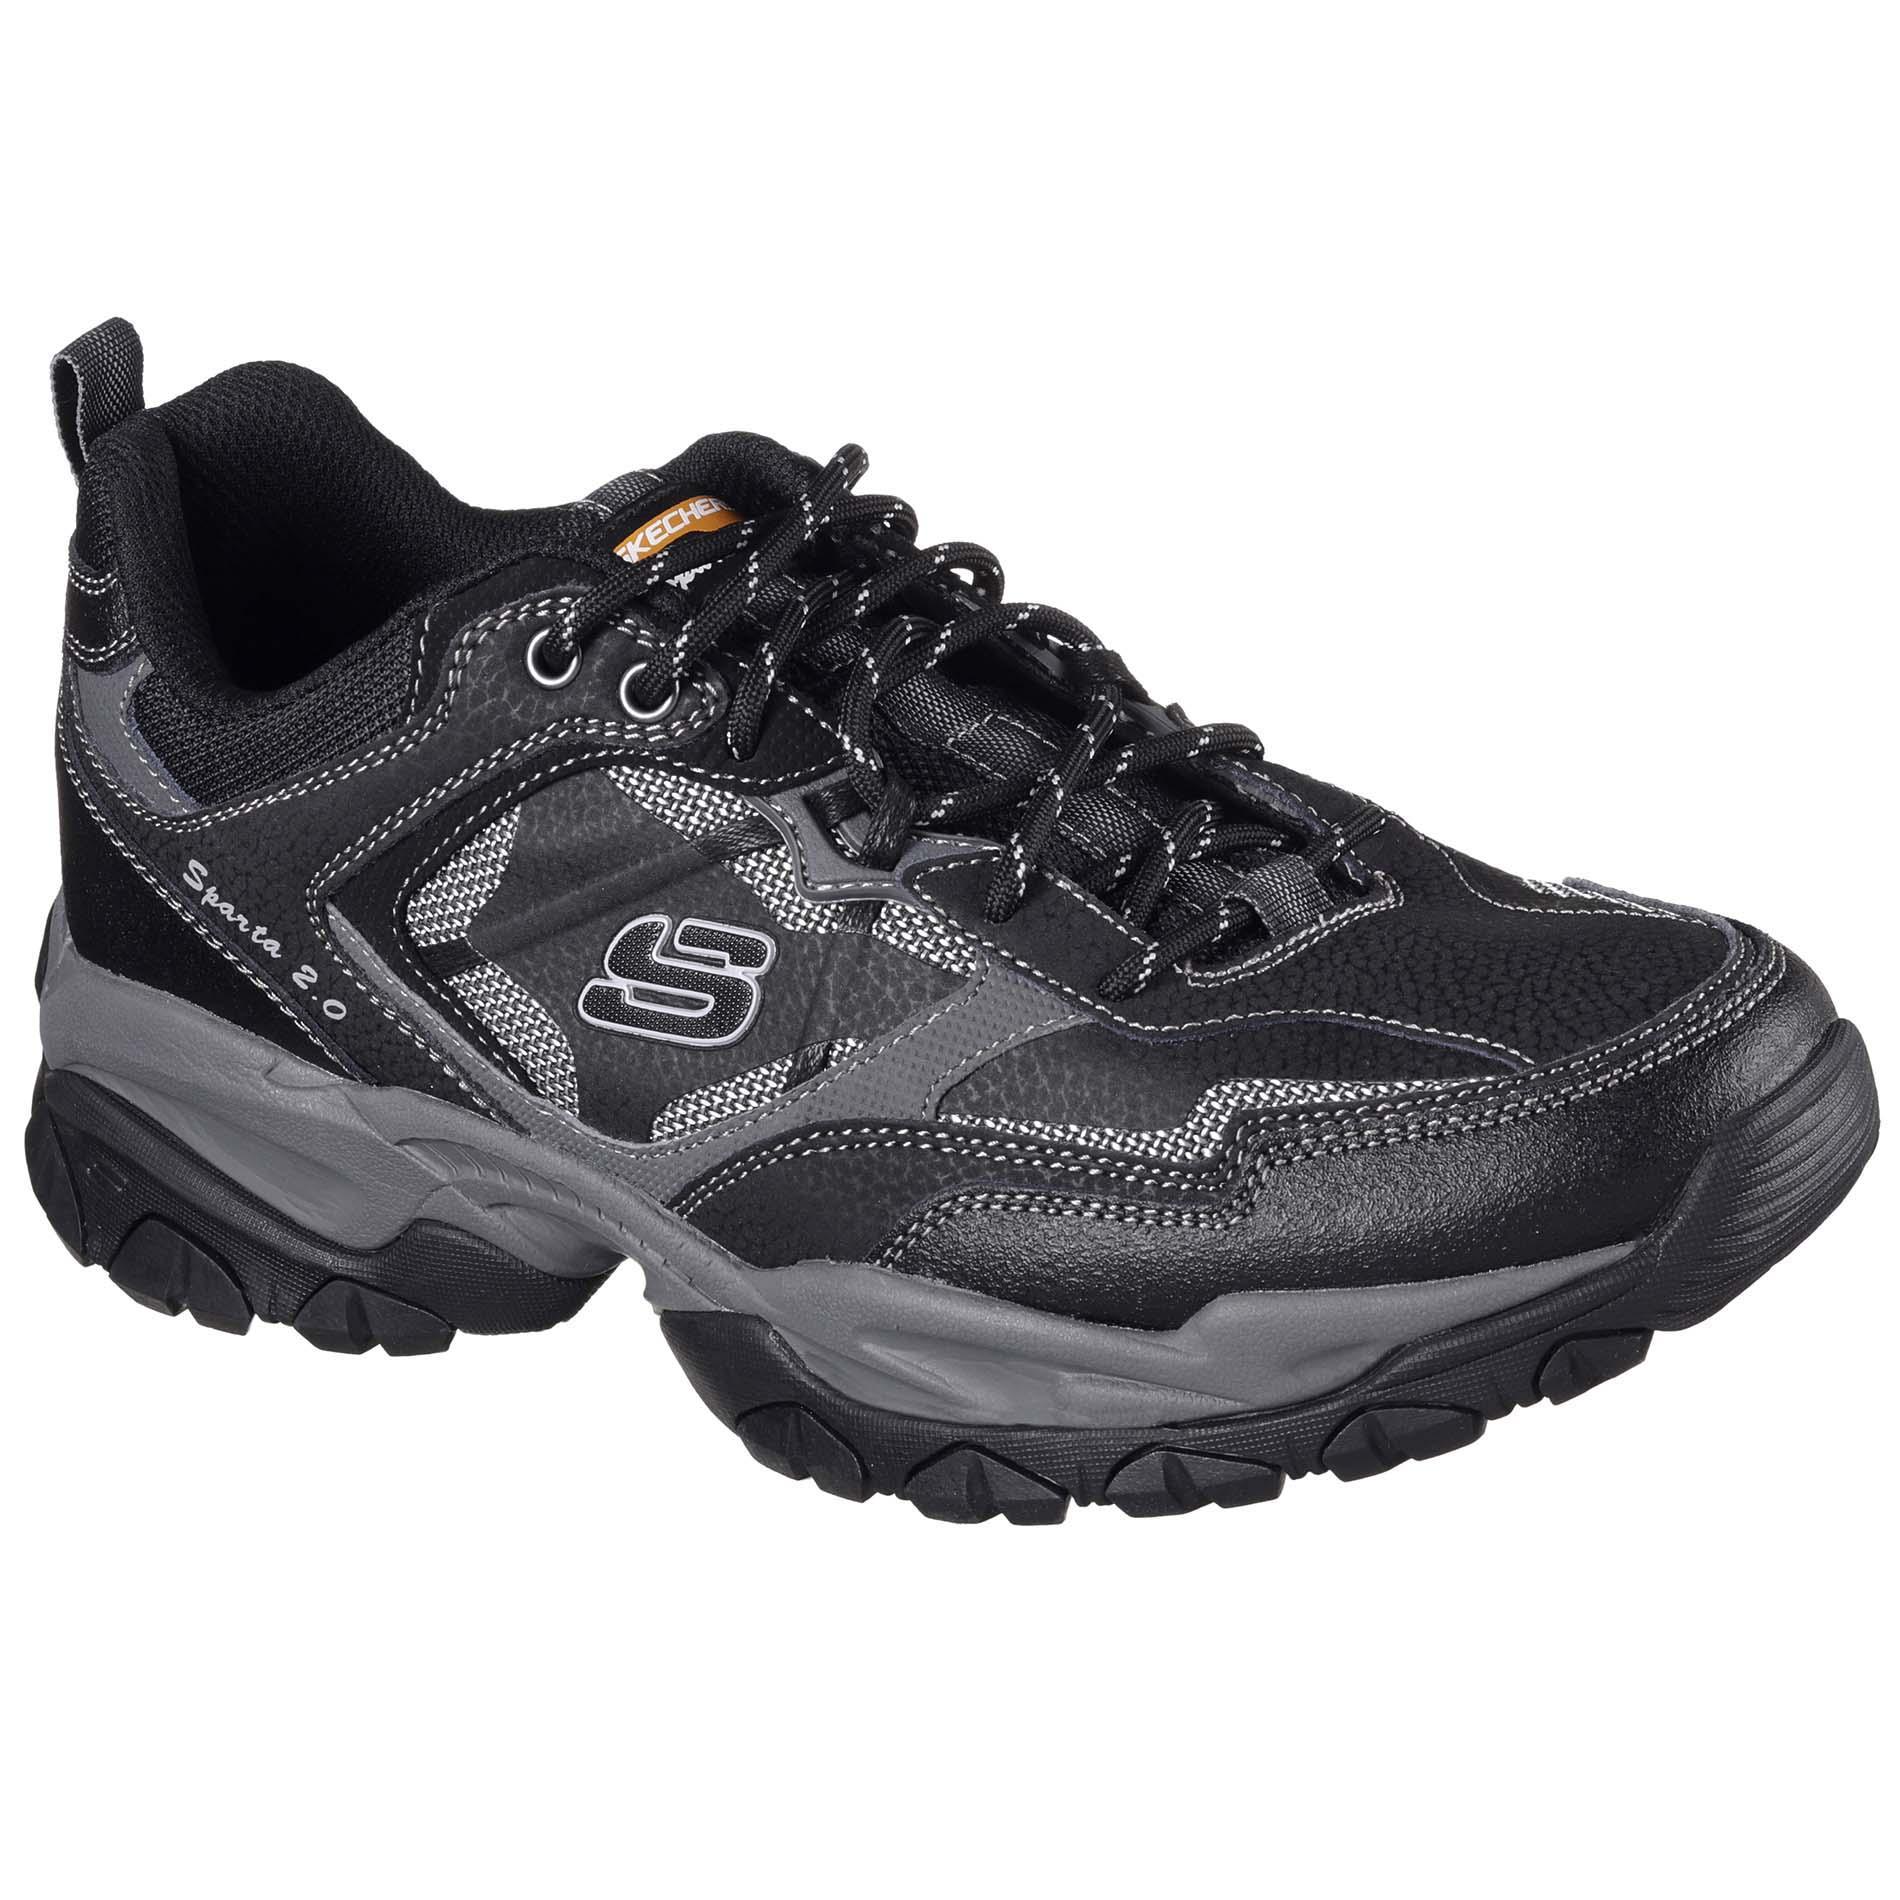 Skechers Men's Sparta 2.0 Athletic Shoe